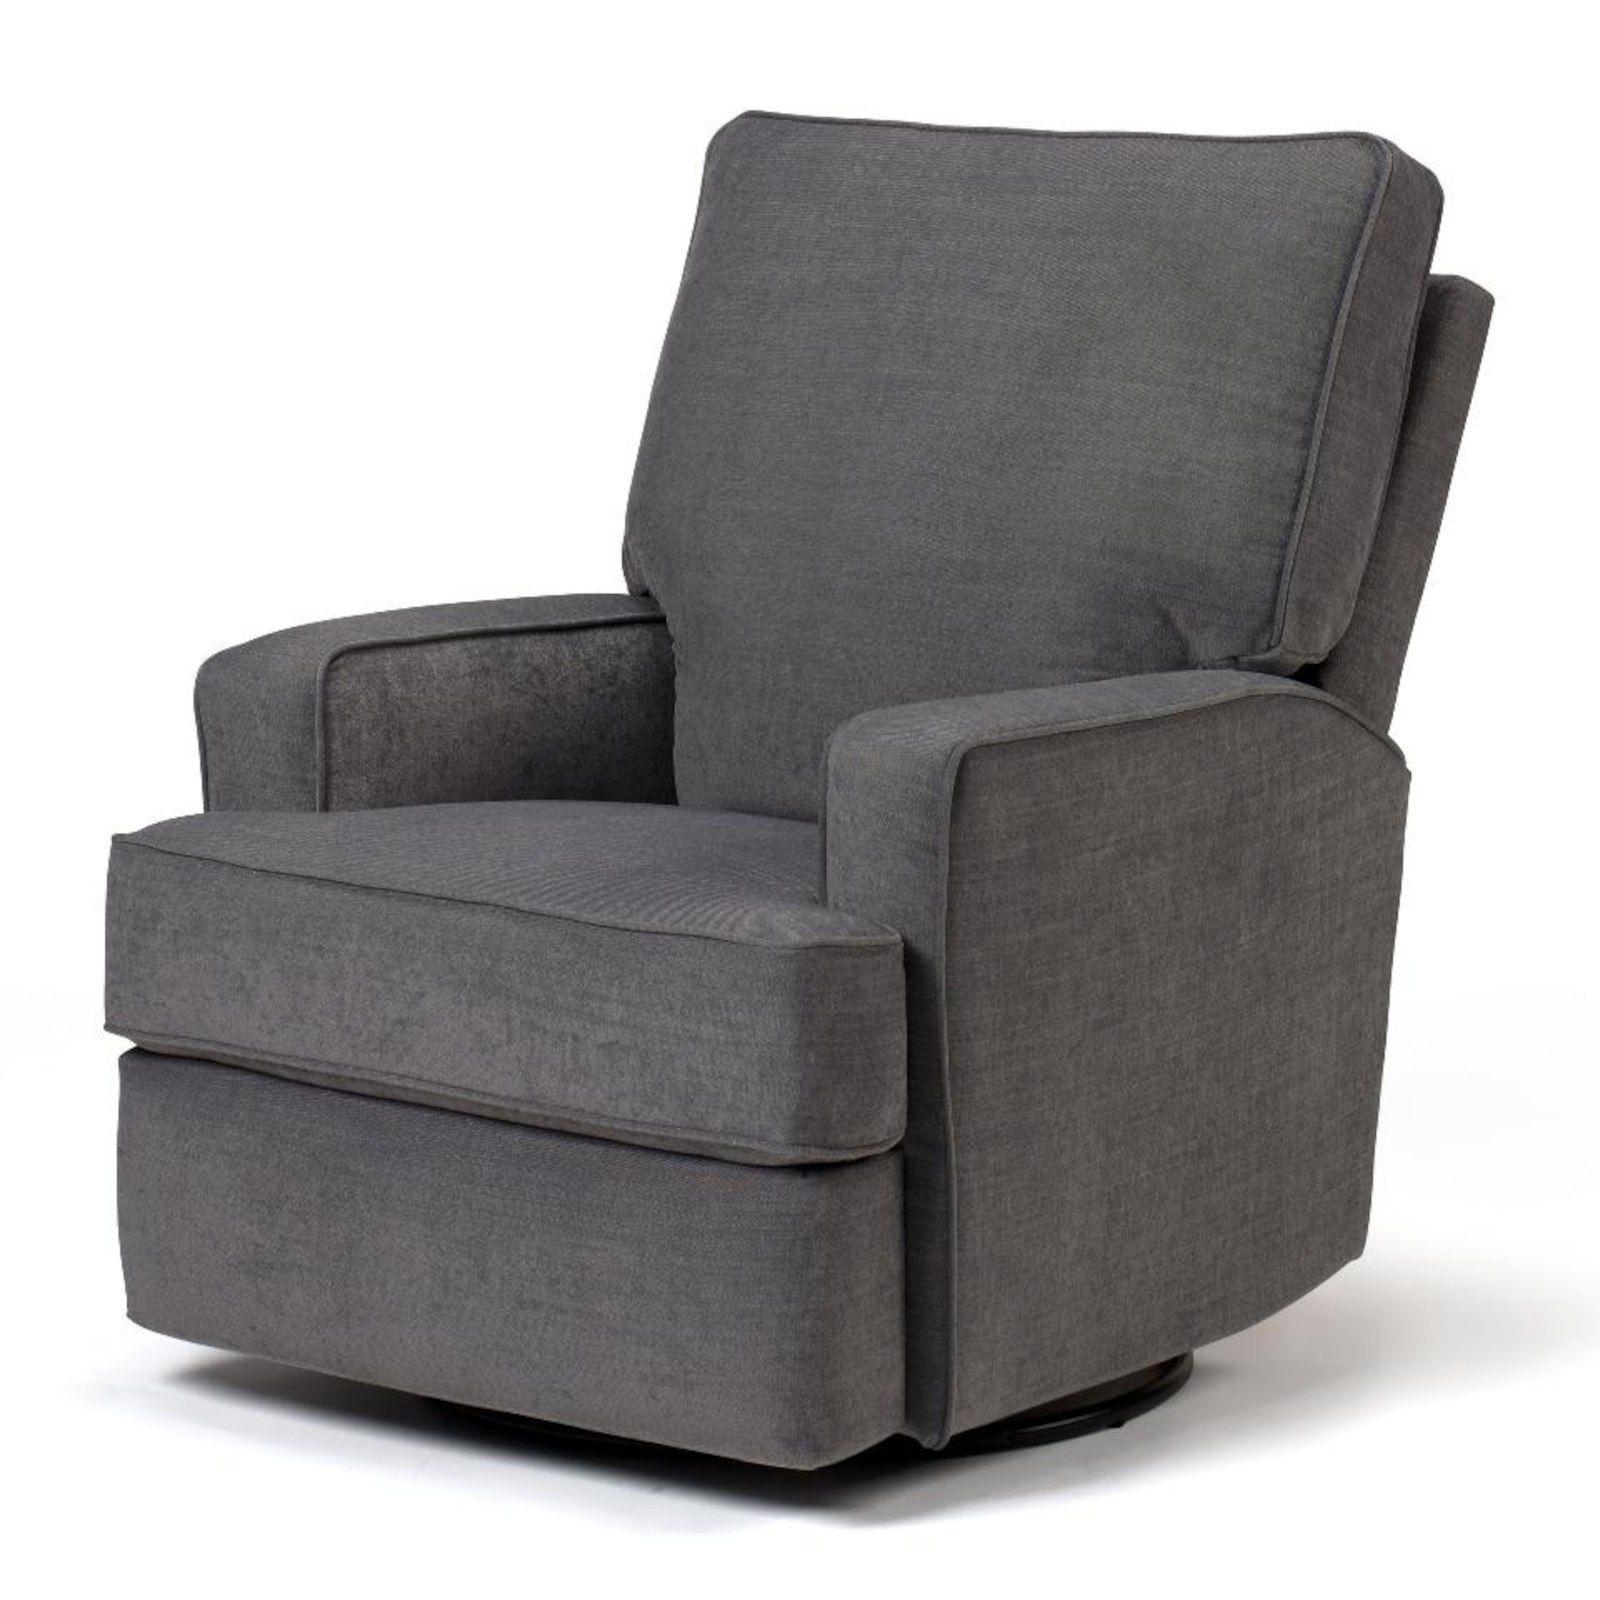 Best Chairs Kersey Swivel Glider Recliner Steel